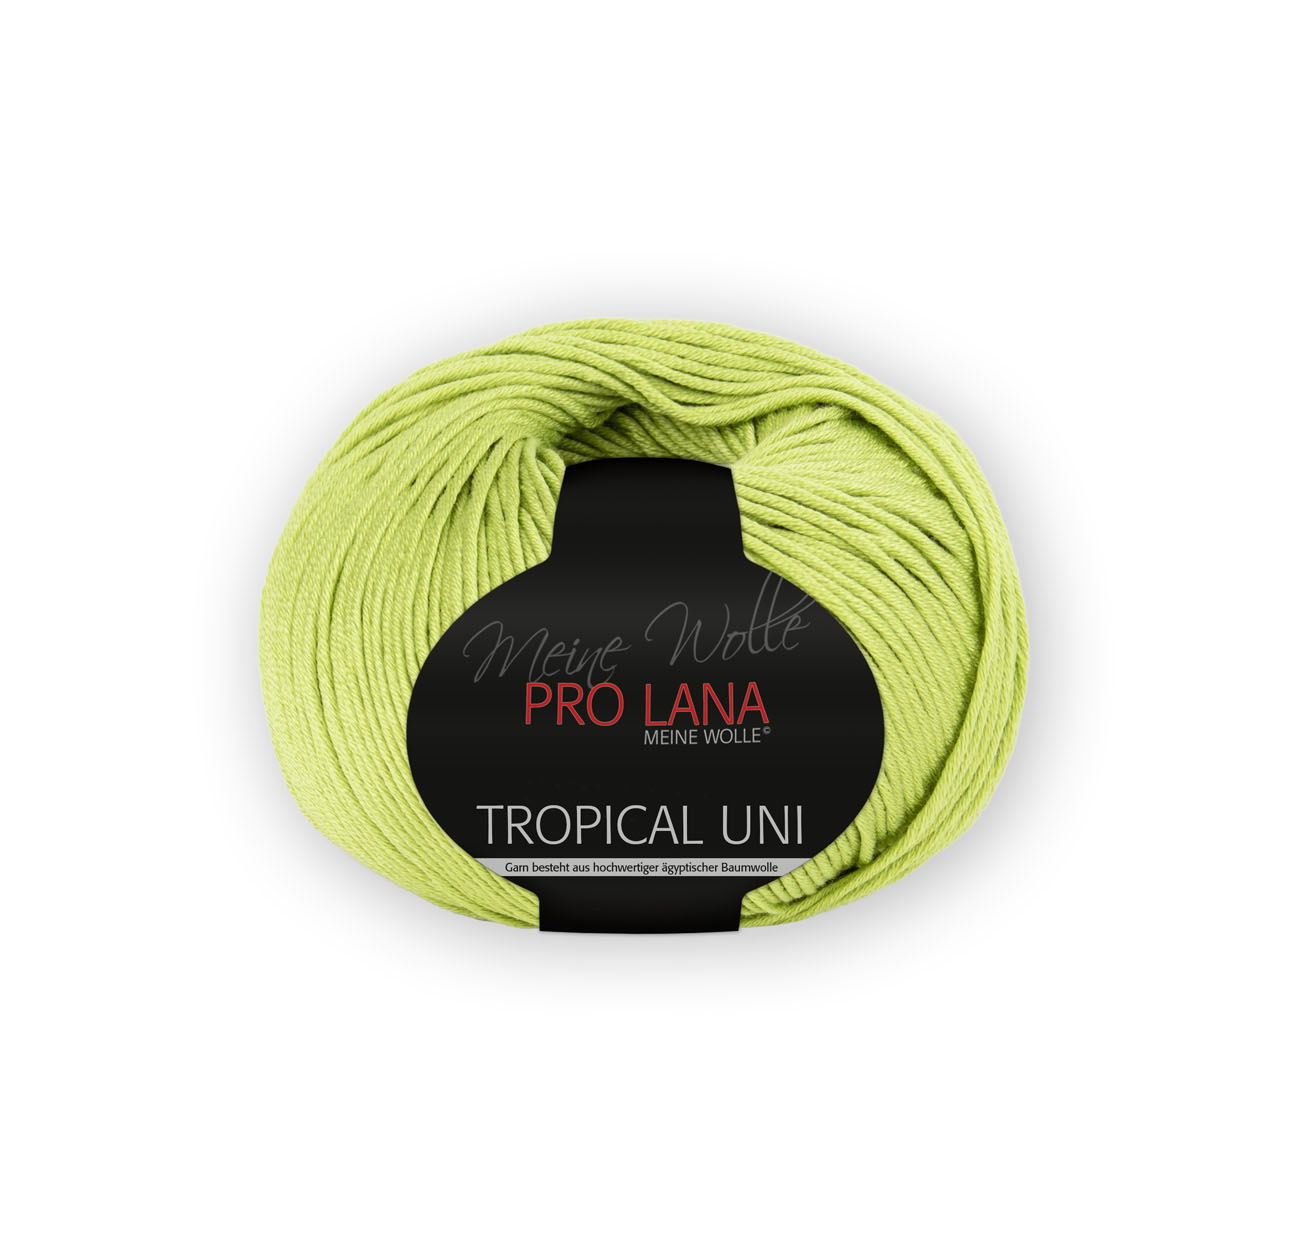 Pro Lana Tropical uni 50g  0,5kg